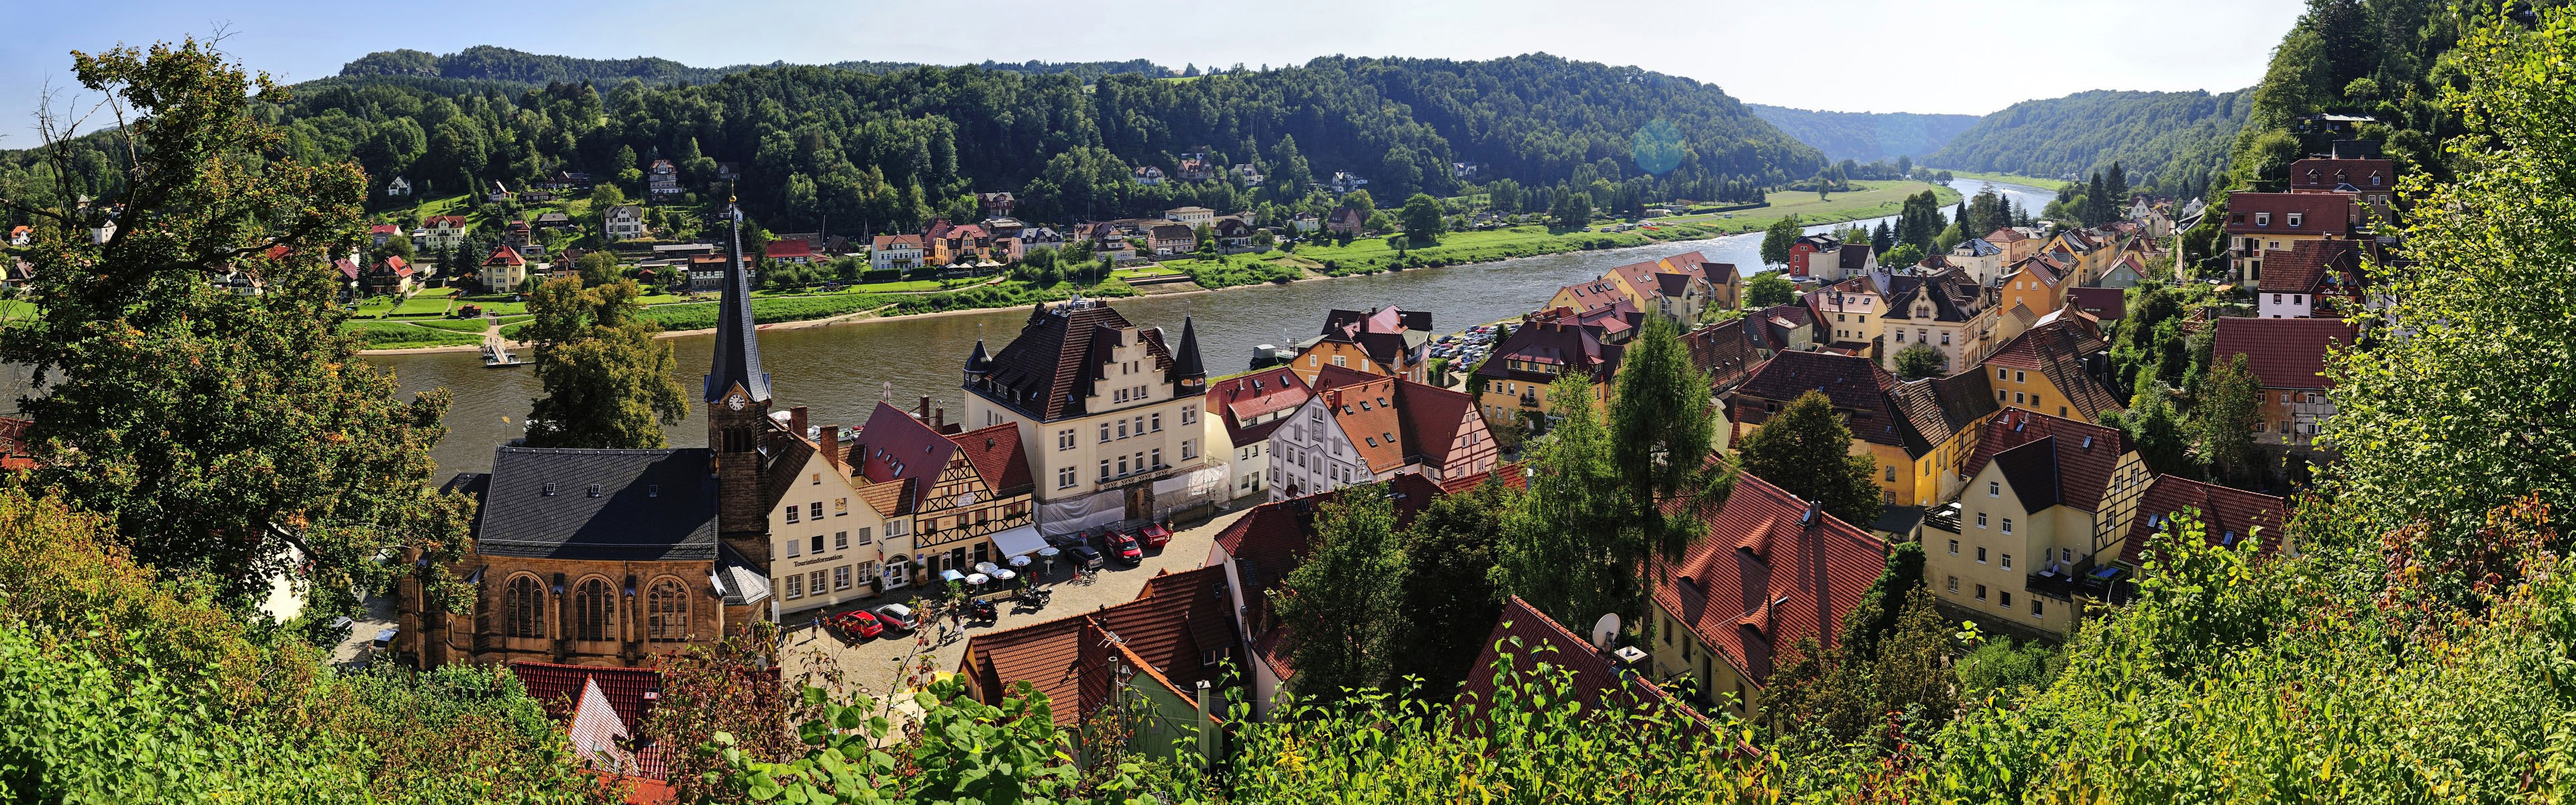 Freudenberg, Germany бесплатно